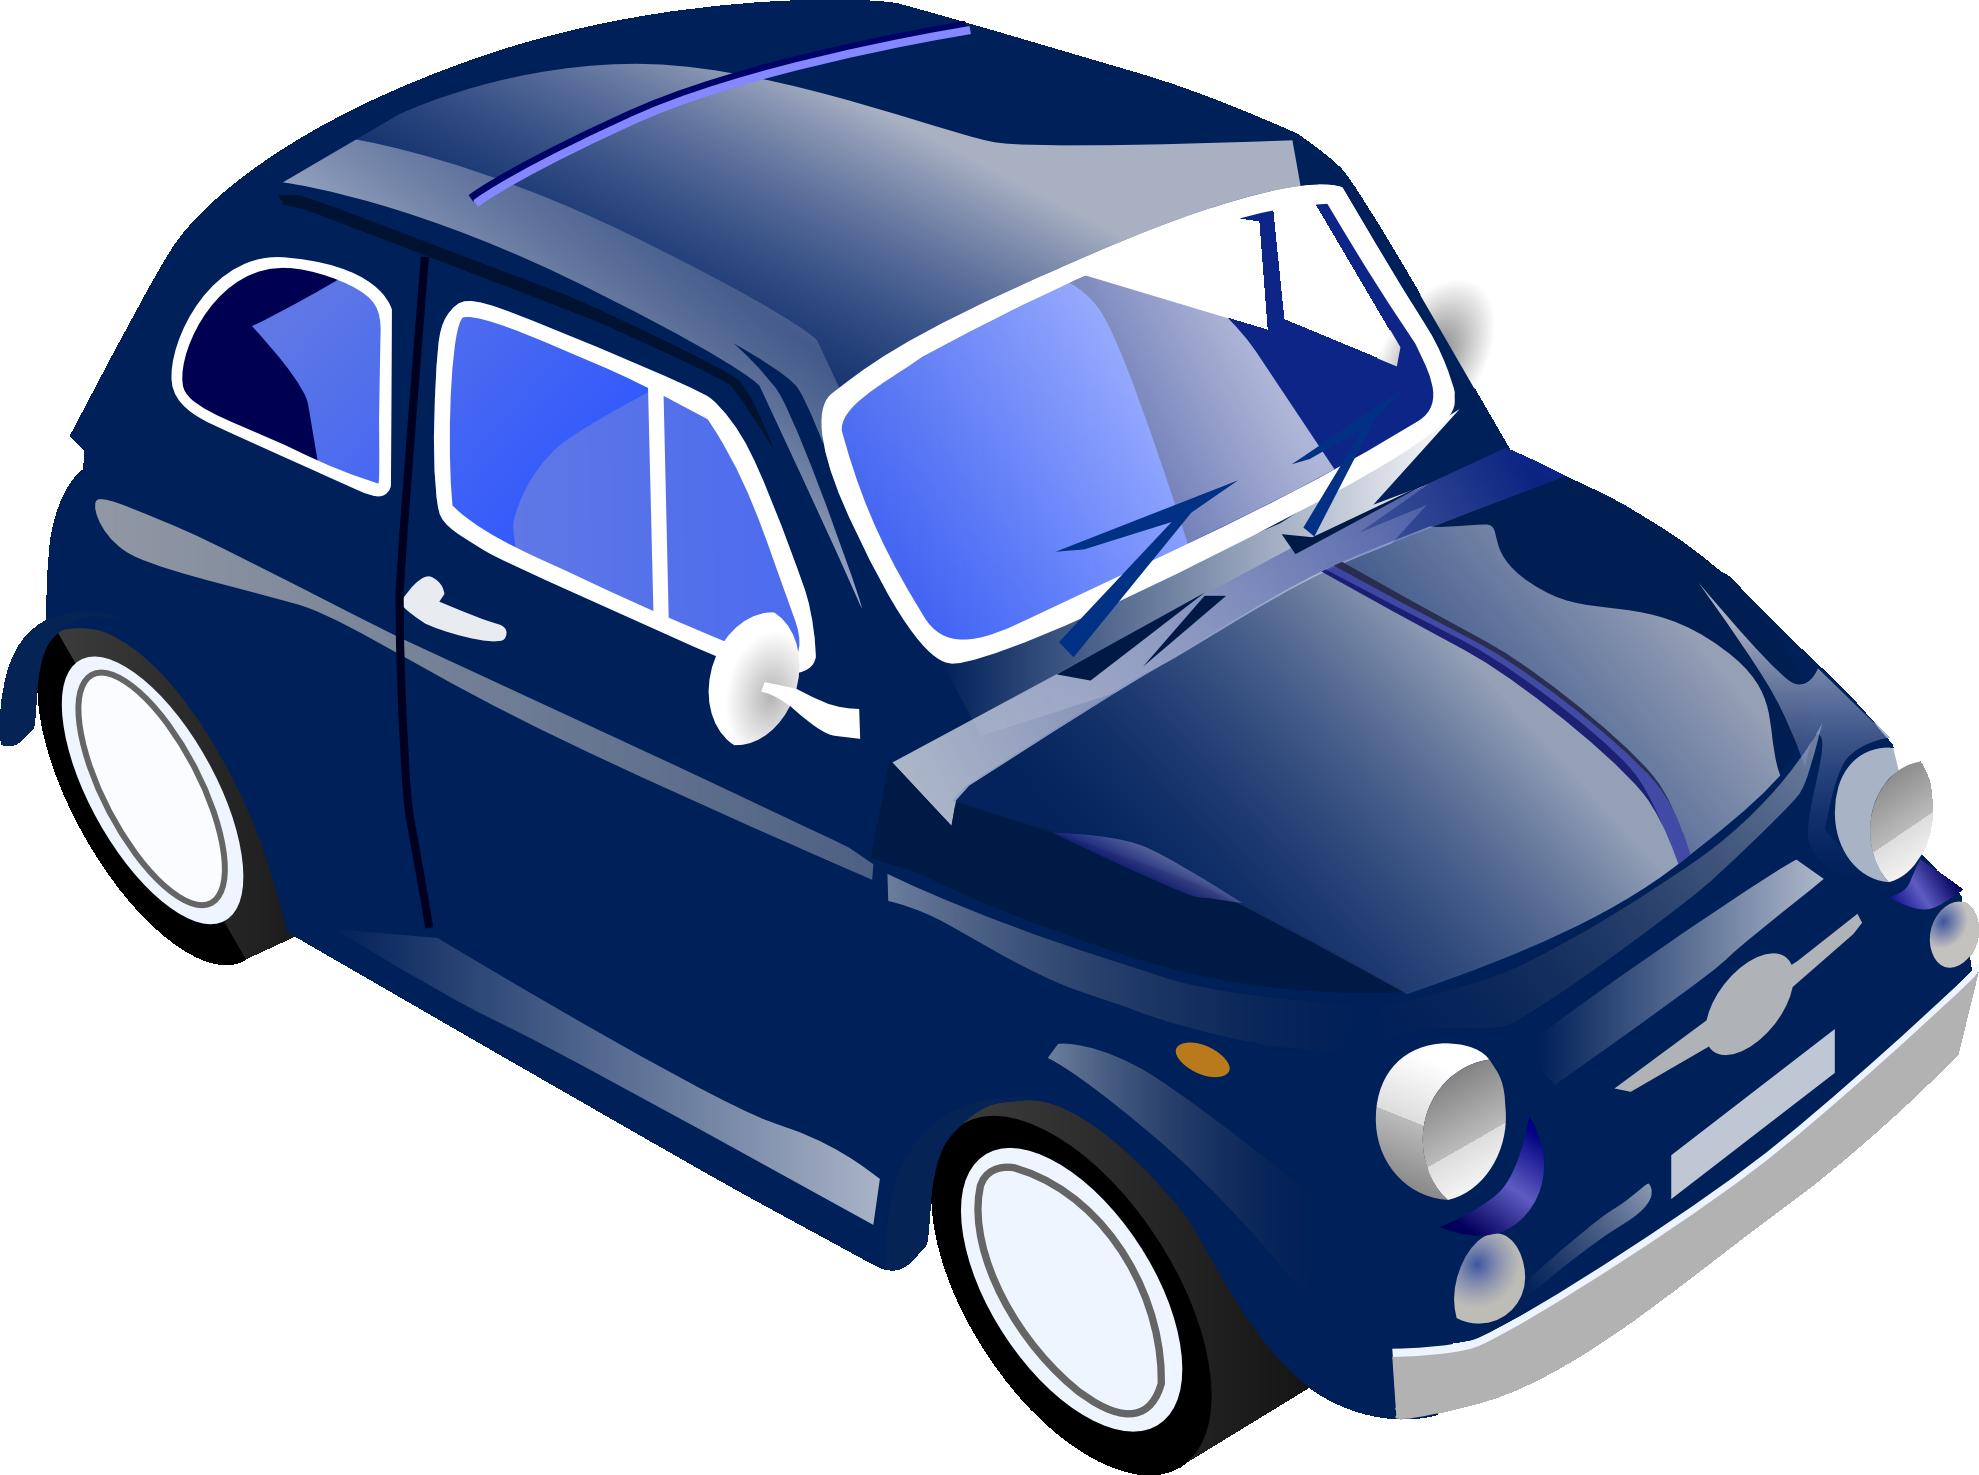 Car factory clipart freeuse download clipartist.net » Clip Art » fiat car factory super duper SVG freeuse download